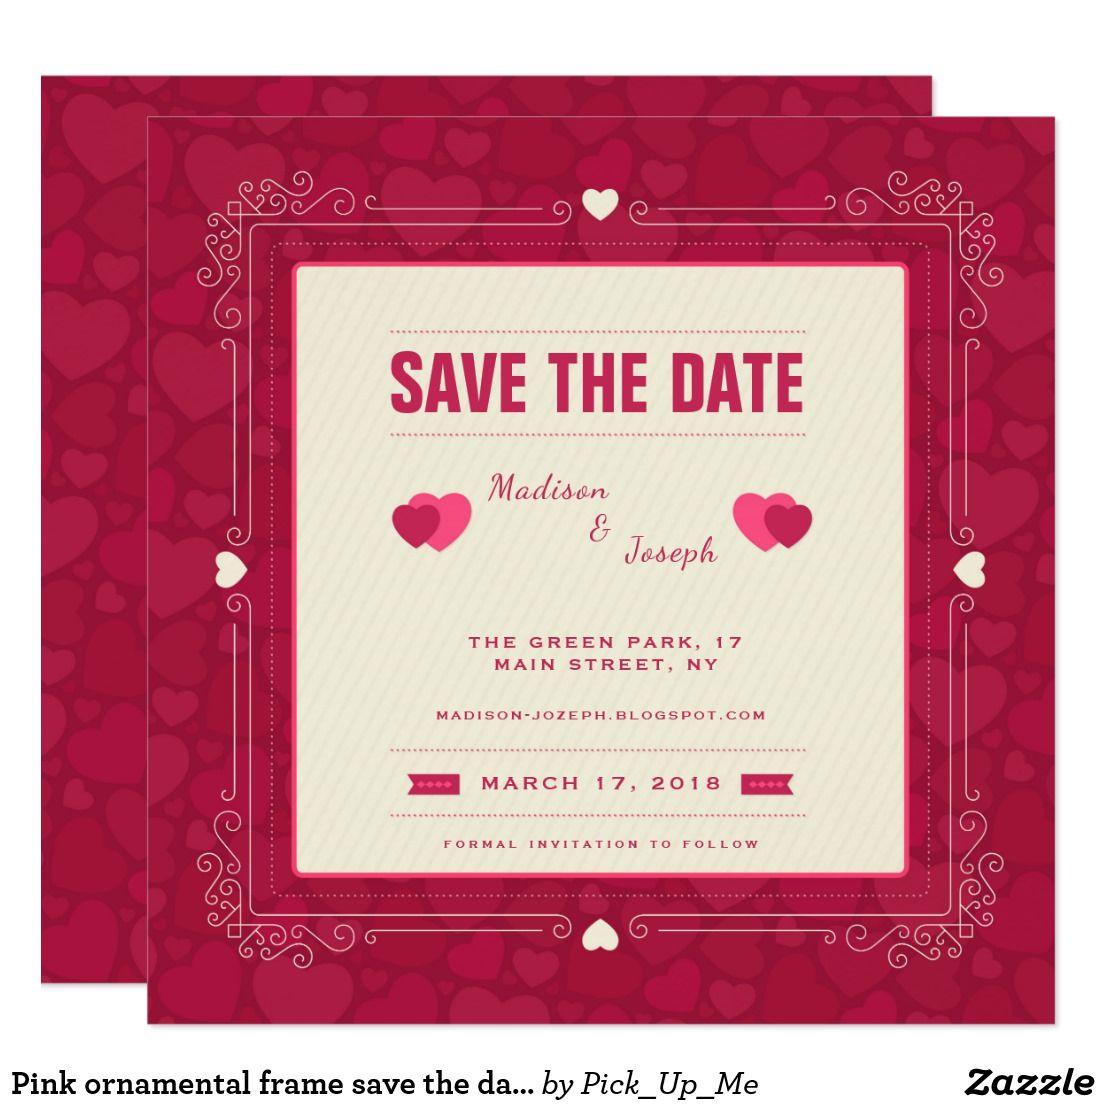 Pink ornamental frame save the date invitation